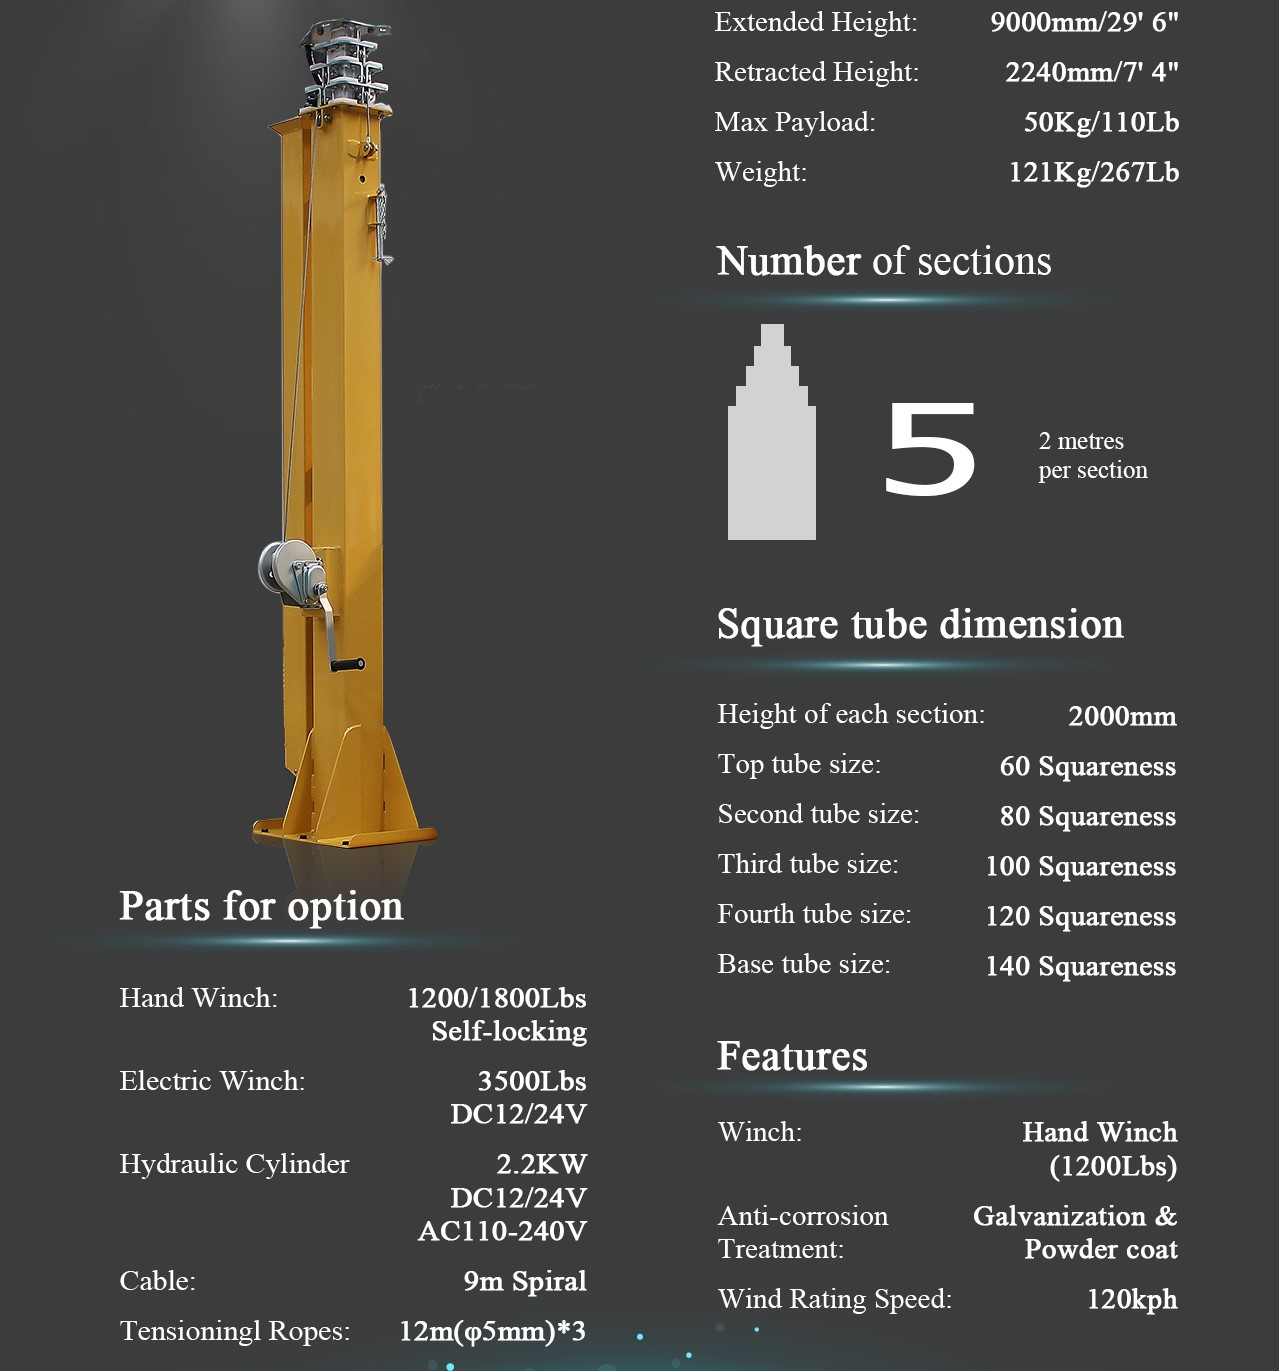 Telescopic Mast Pole, Solar Light Tower, Light Tower, Refugee Camps Solar Light Tower, mobile light towers, Job Site Solar Light Tower, Portable Solar Light Towers, Solar Powered Construction Light Tower.